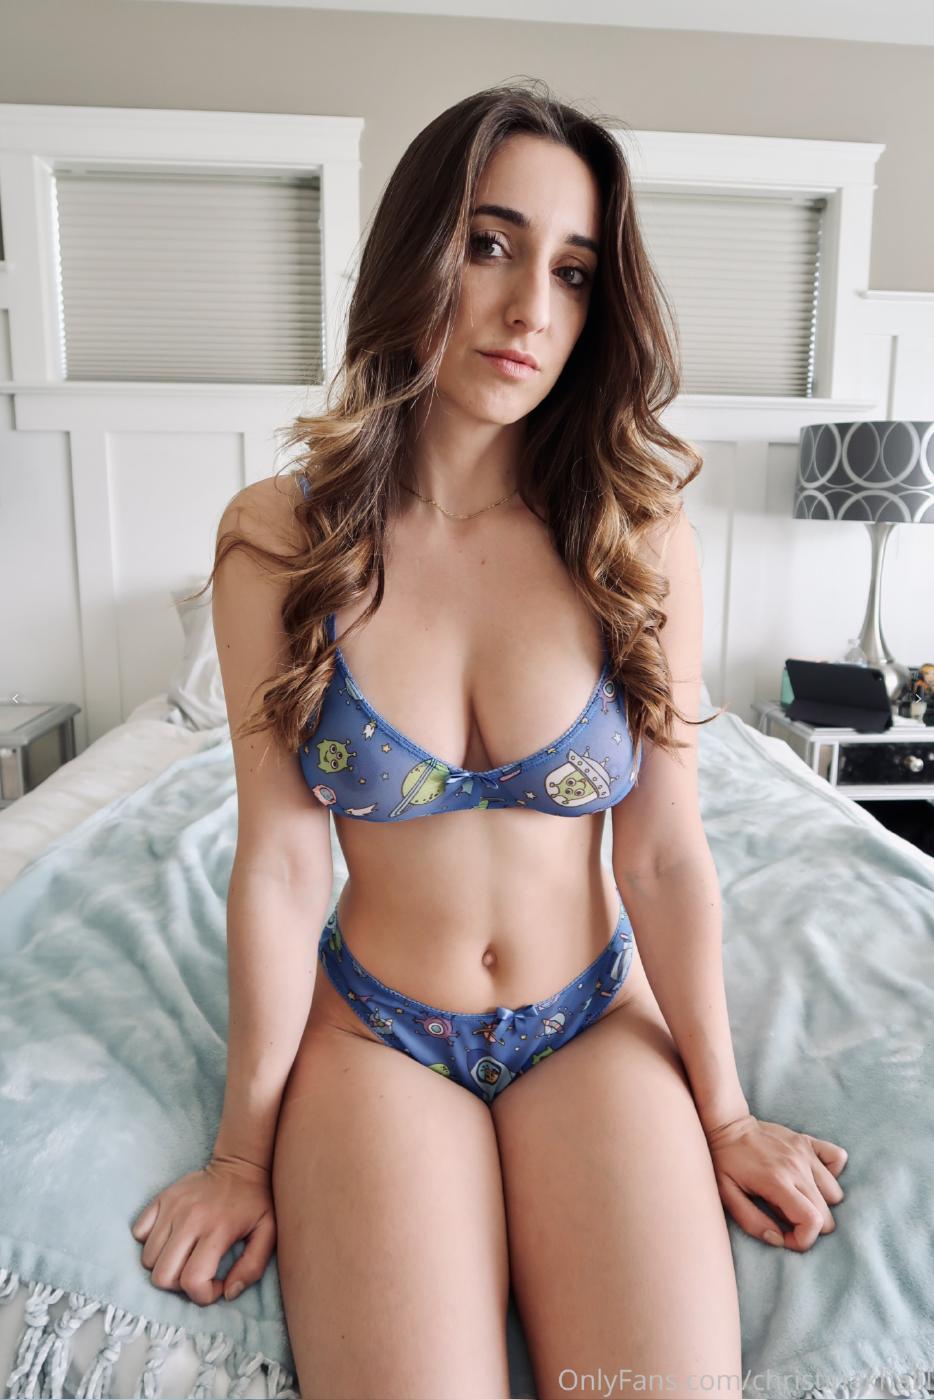 Christina Khalil See Through Lingerie Onlyfans Set Leaked Sxmirs